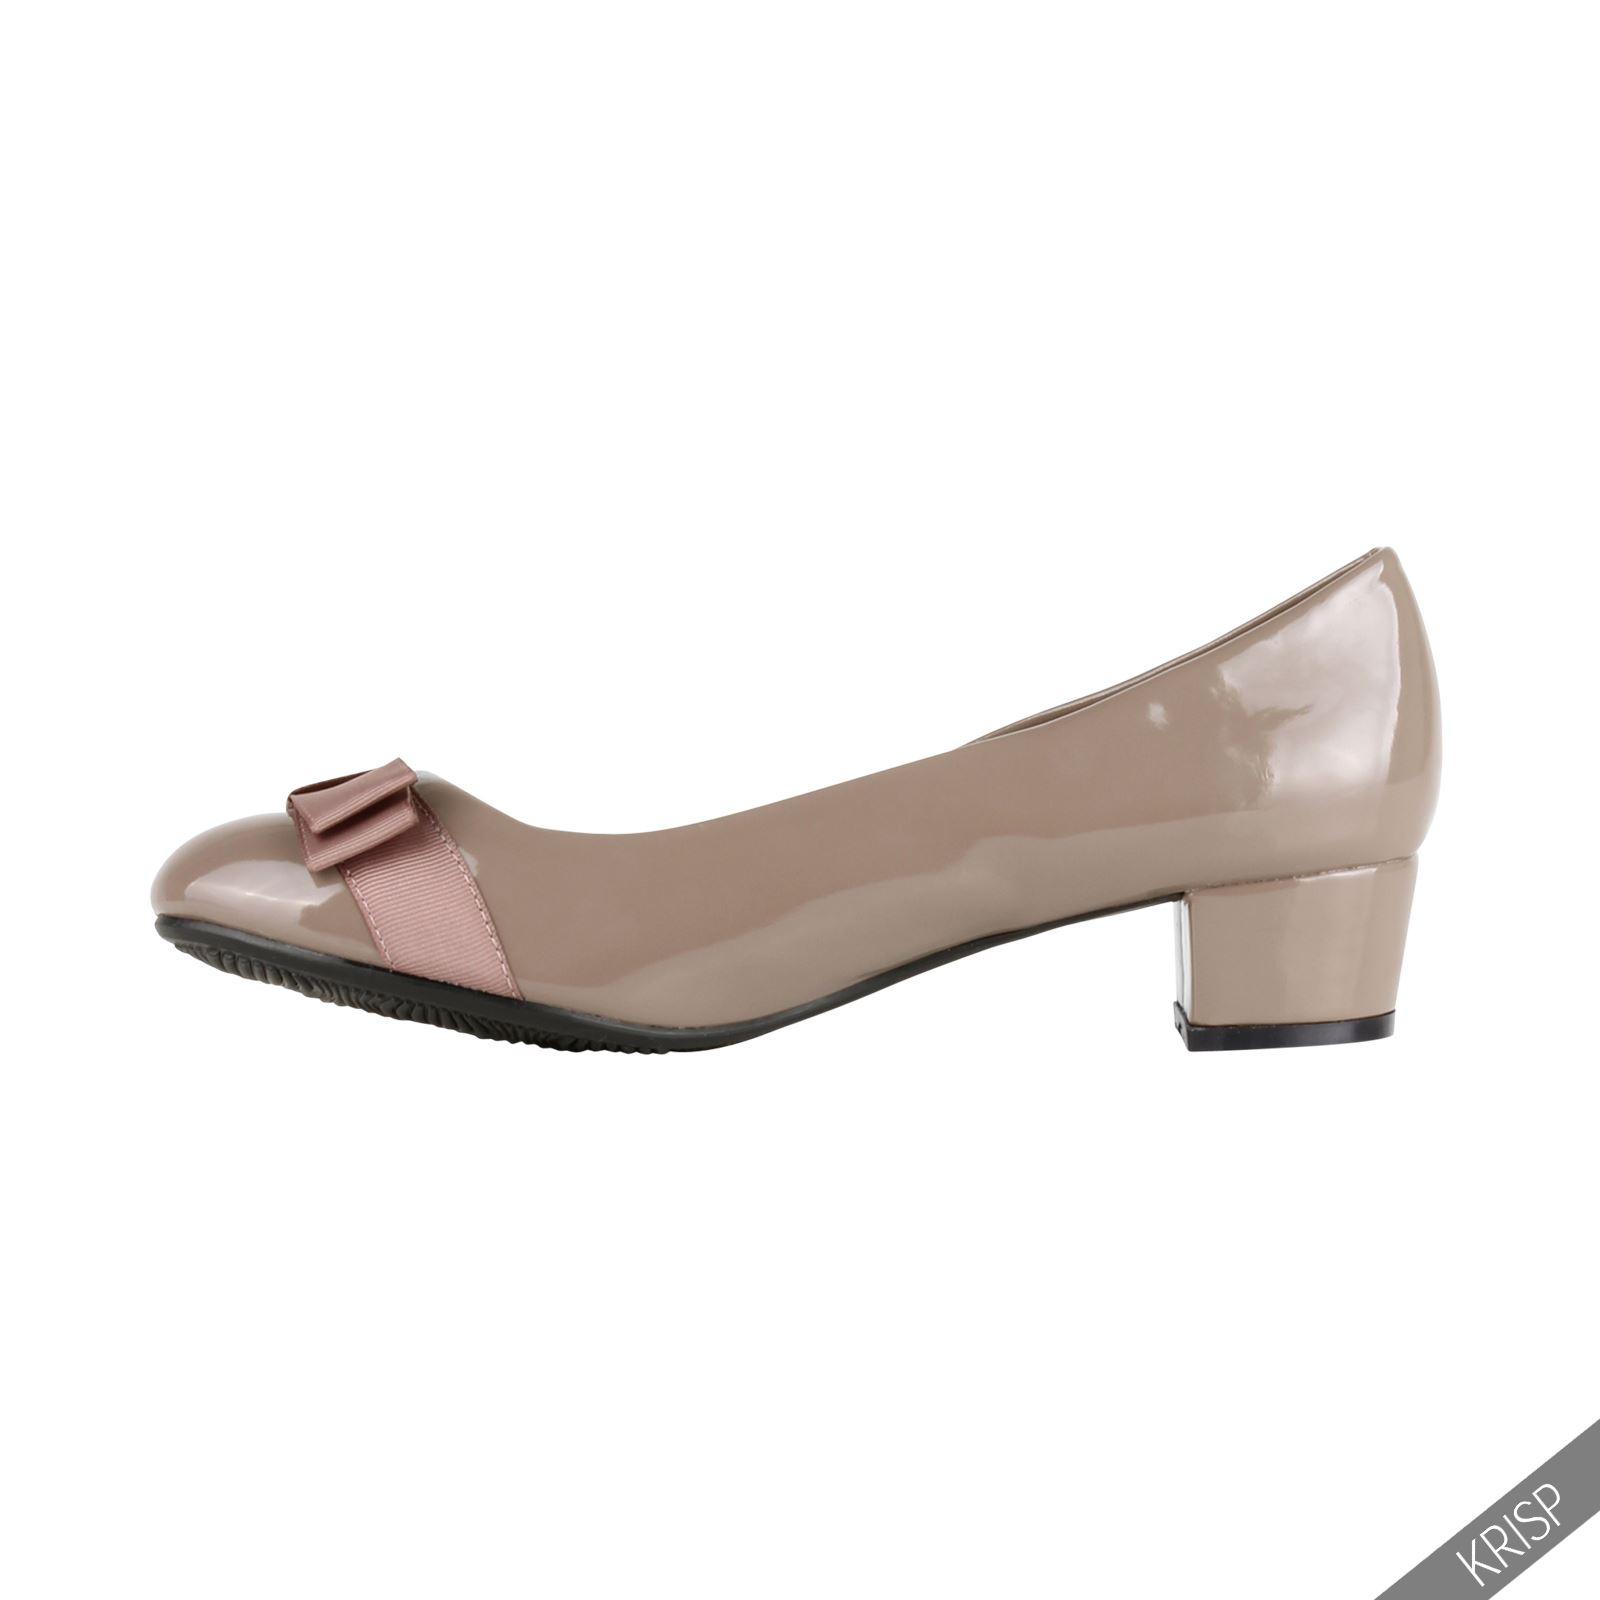 500a041c62b ... talons Bas bleu Marine travail chaussures pour. s